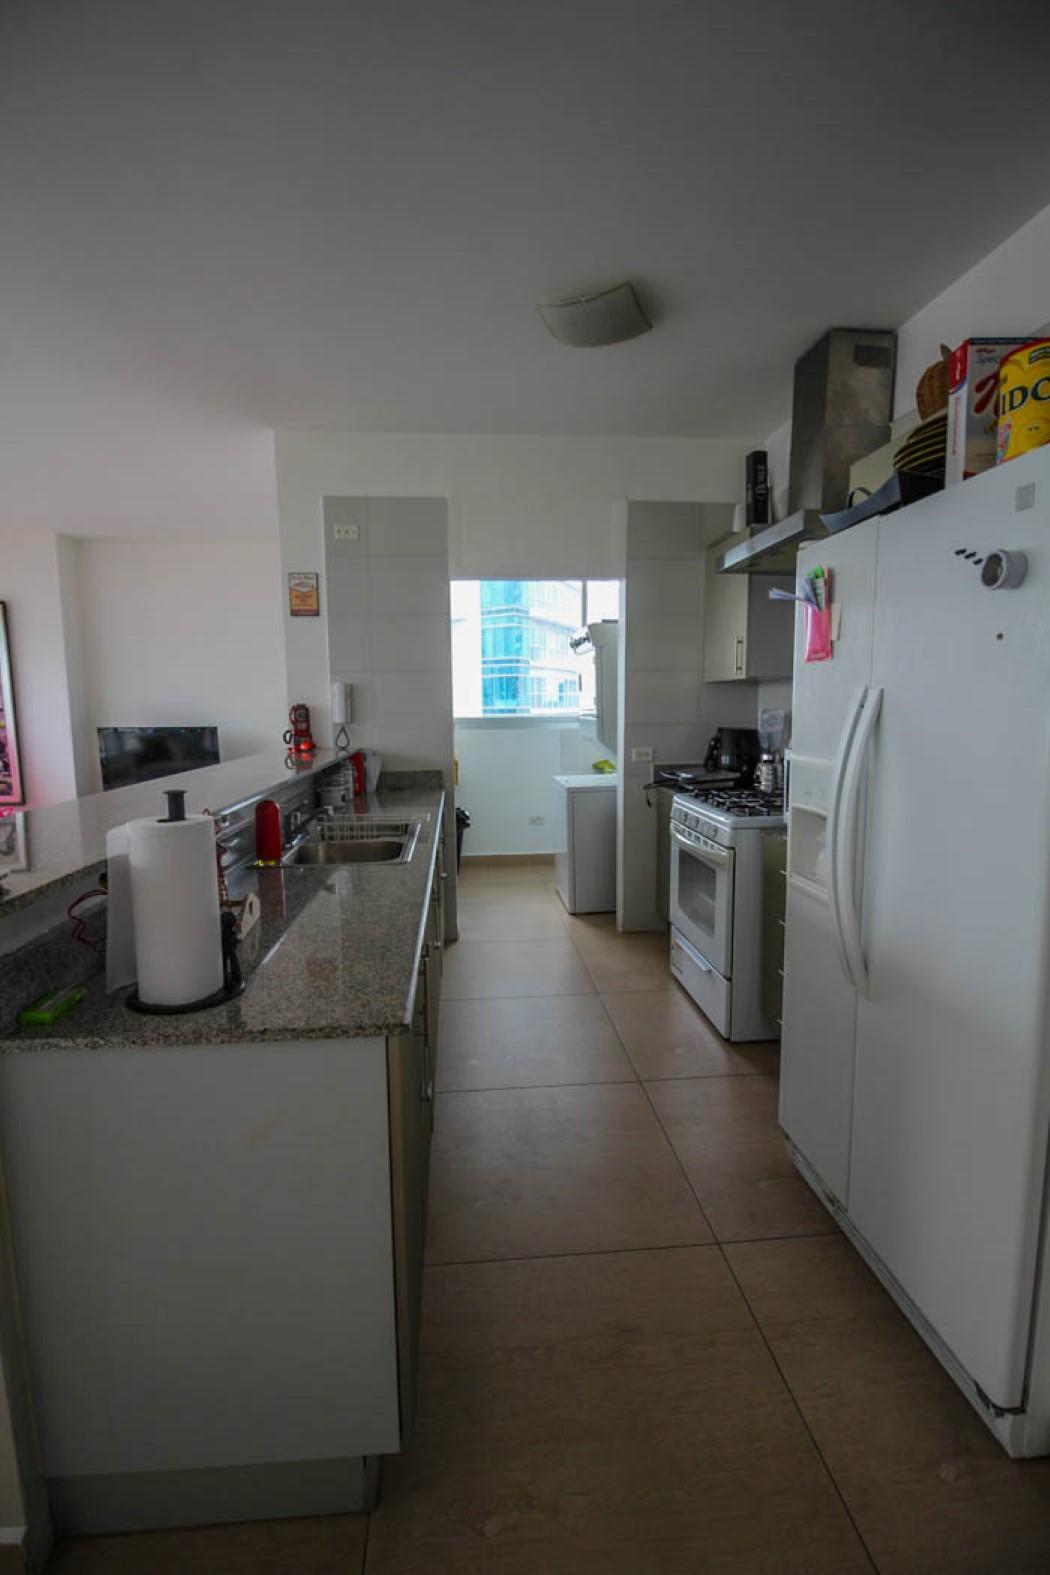 Avenida-Balboa-Panama-property-panamaequityocean-city-views-2nd-line-balboa-ave-7.jpg